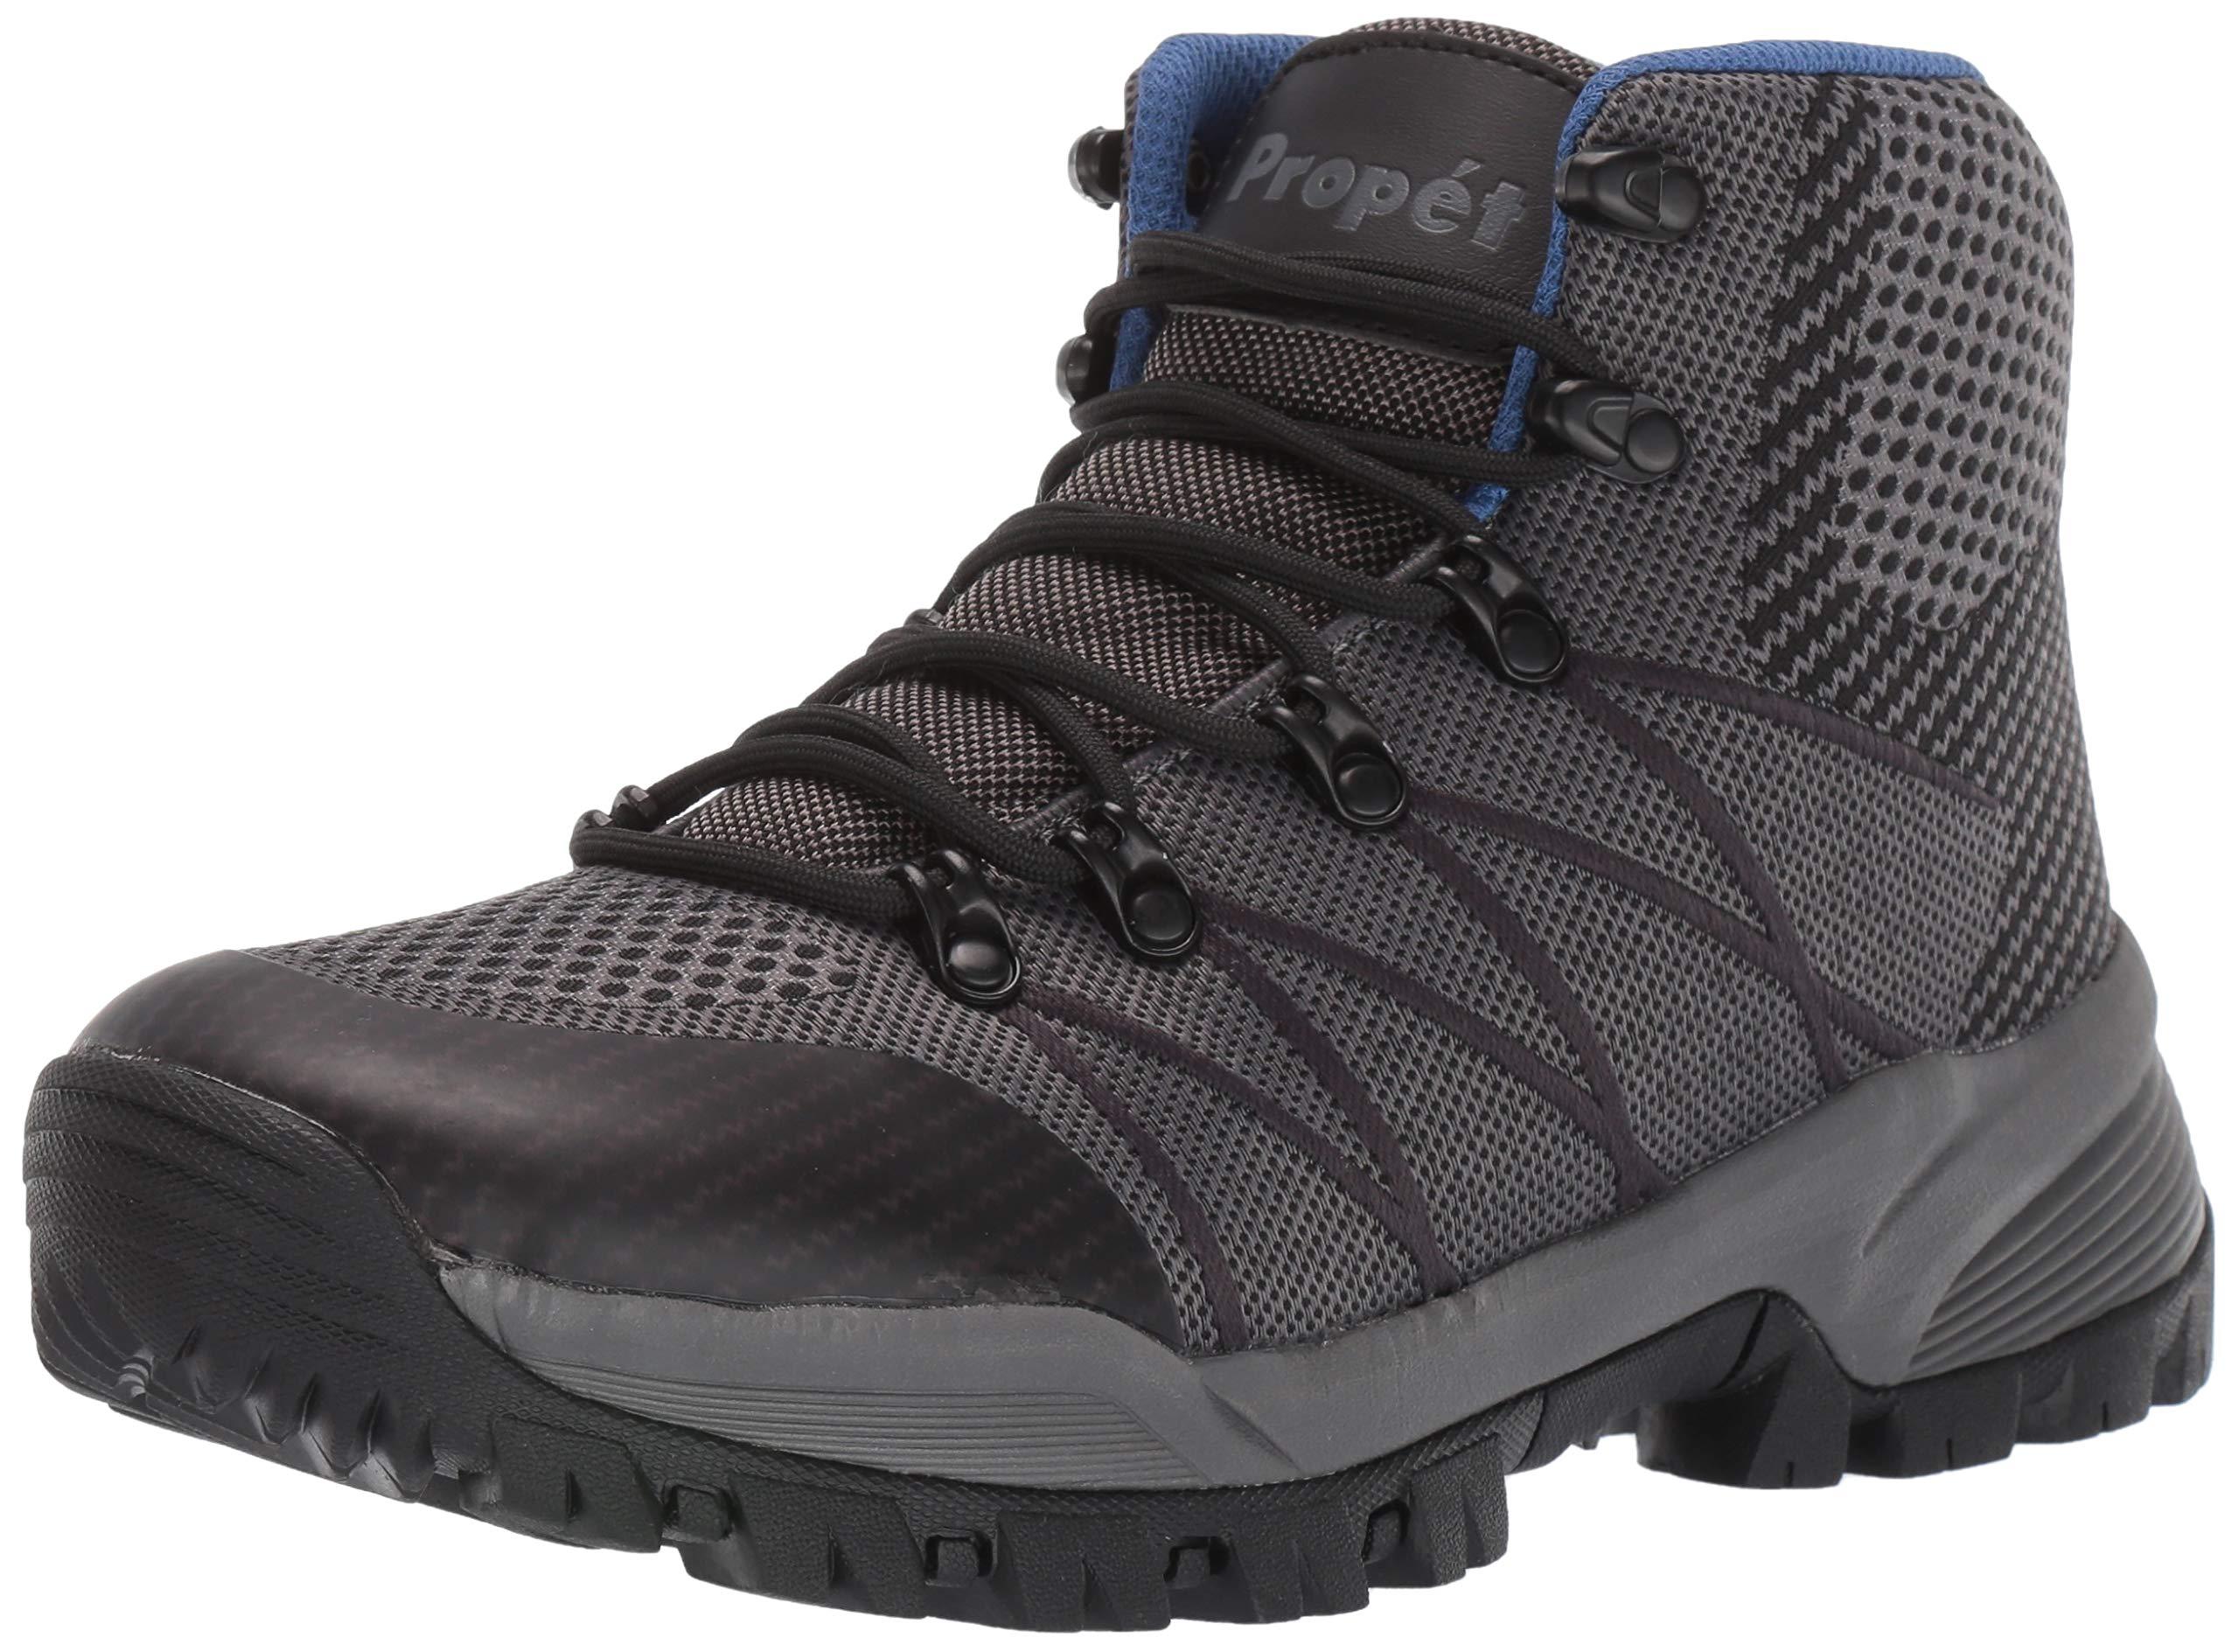 Propet Men's Traverse Hiking Boot, Grey/Black, 10 5E US by Propét